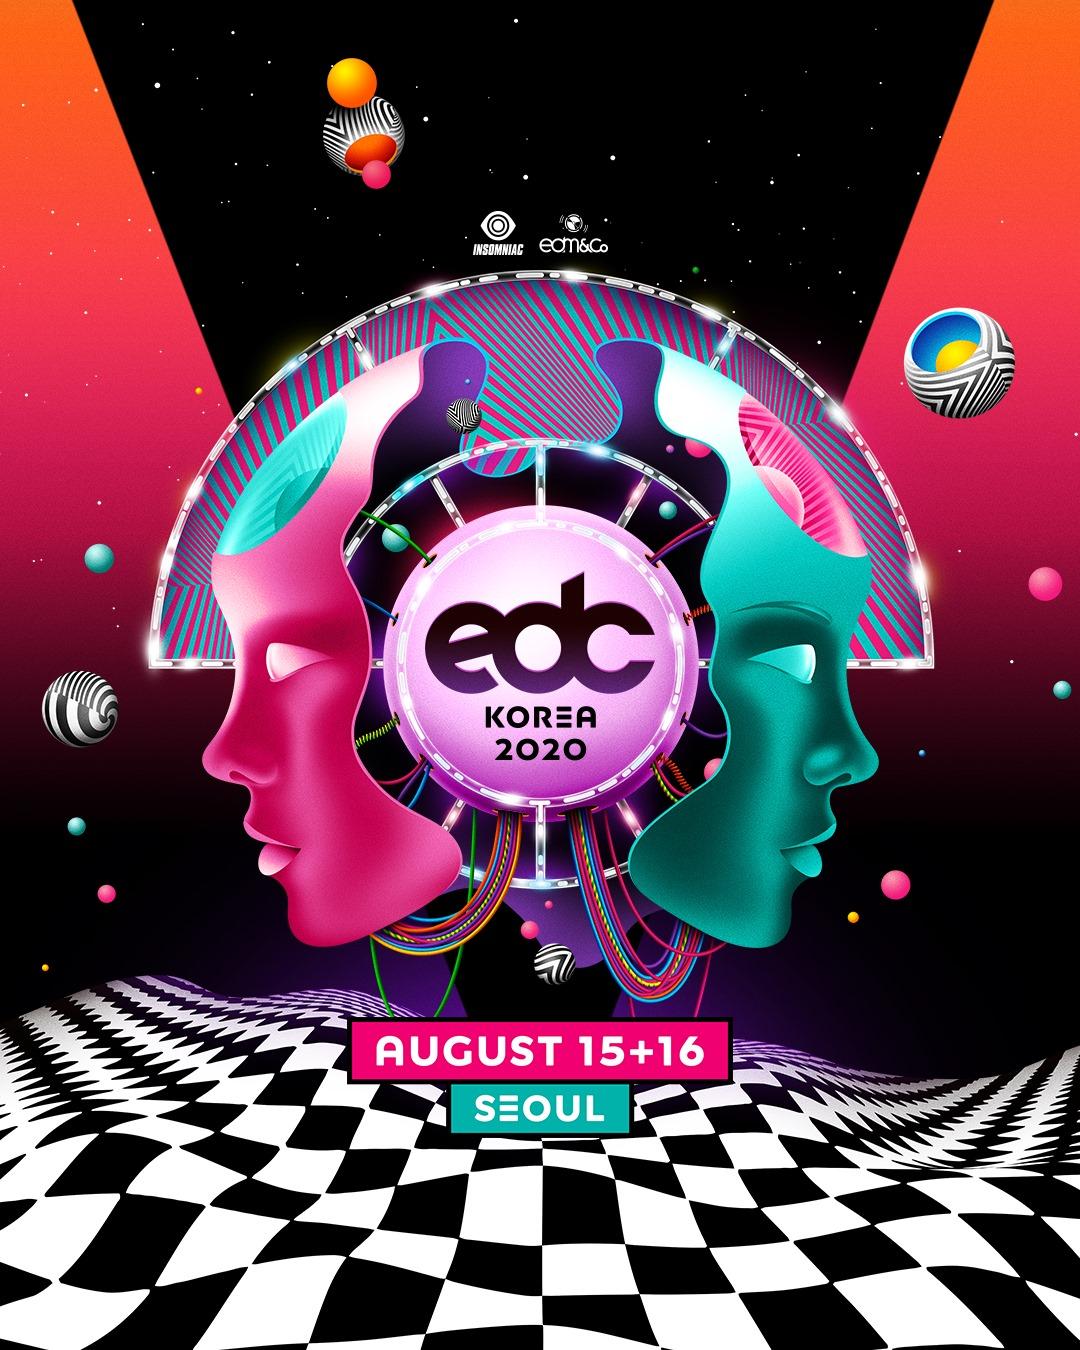 EDC Korea 2020 Announcement